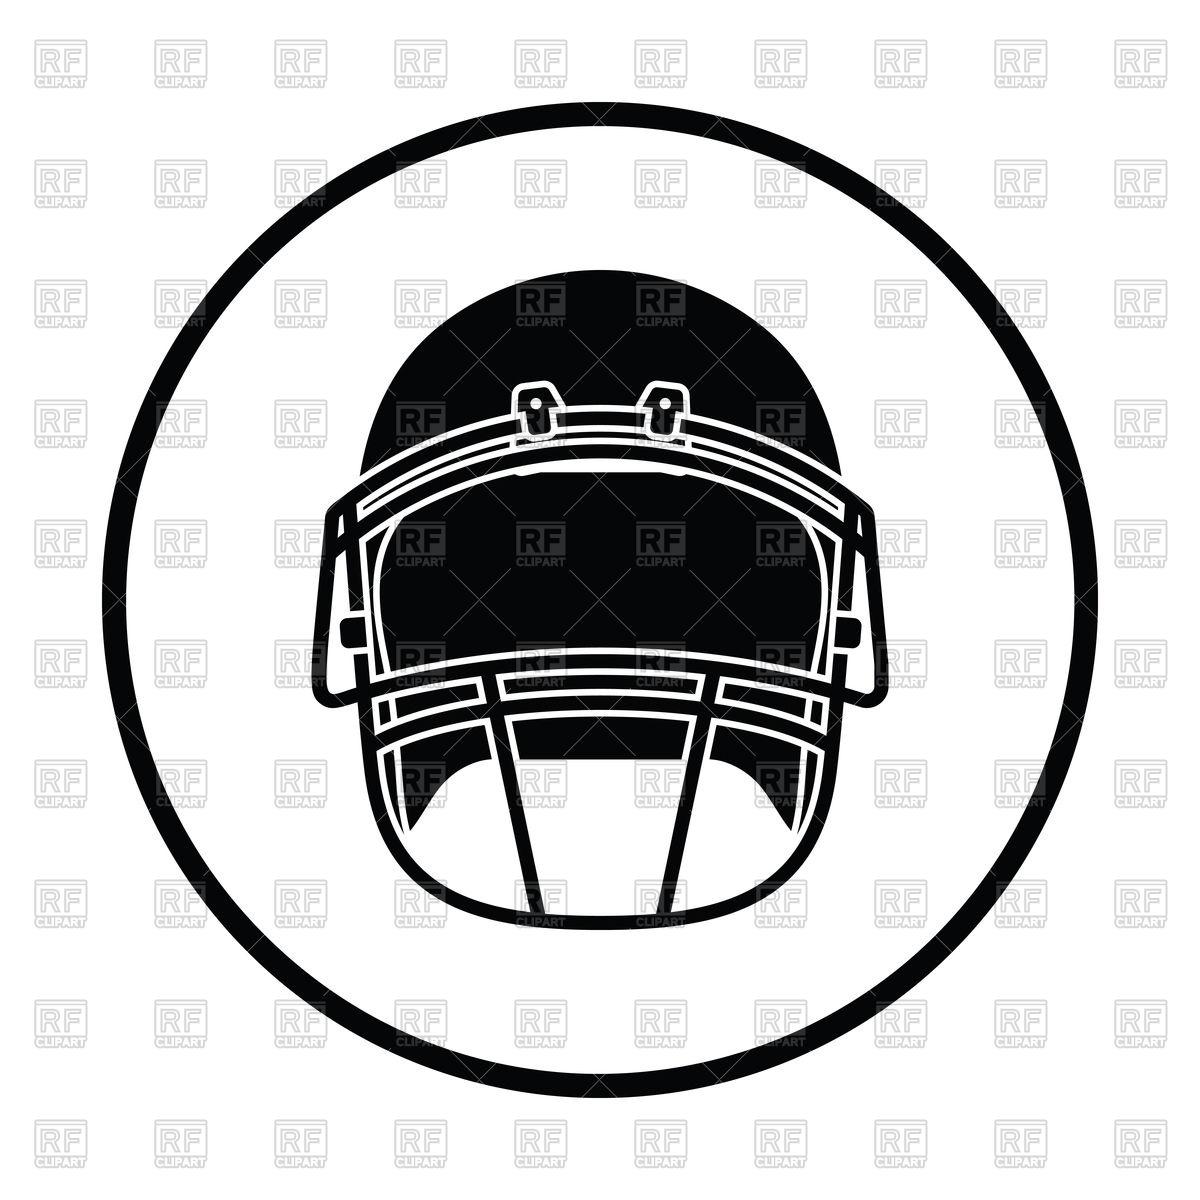 1200x1200 Thin Circle Design Of American Football Helmet Icon Royalty Free